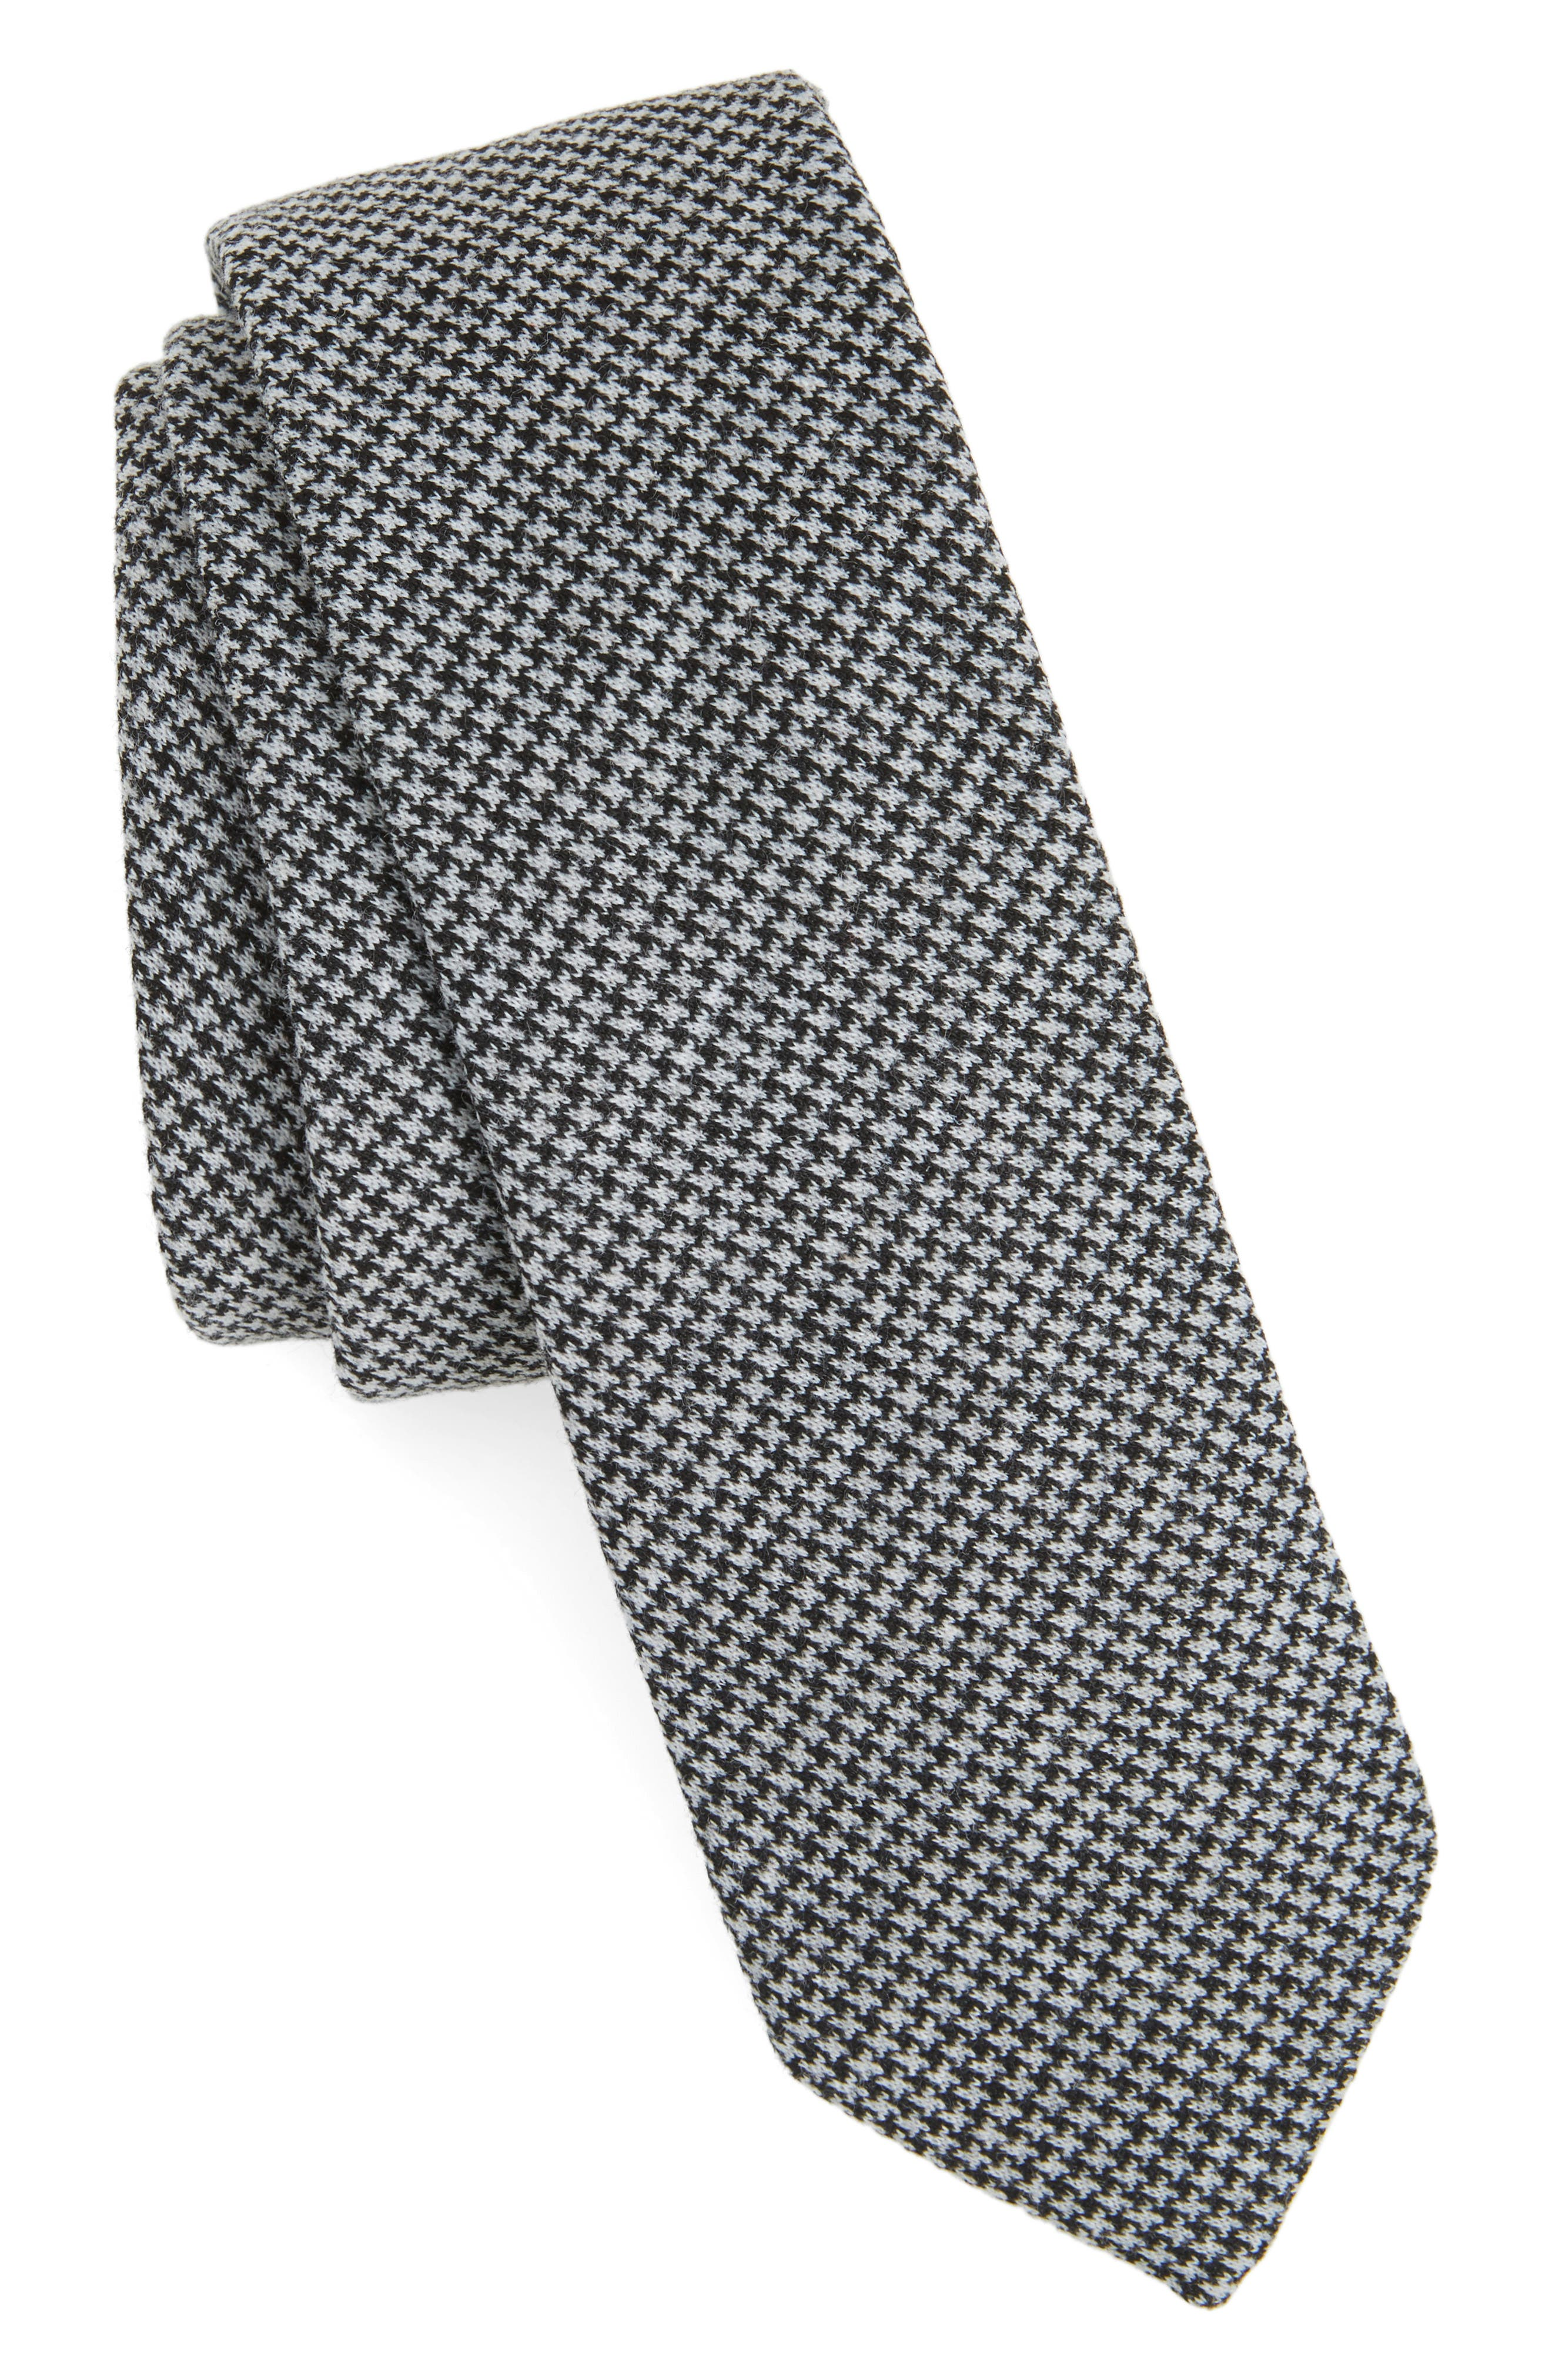 Alternate Image 1 Selected - 1901 Walton Houndstooth Skinny Tie